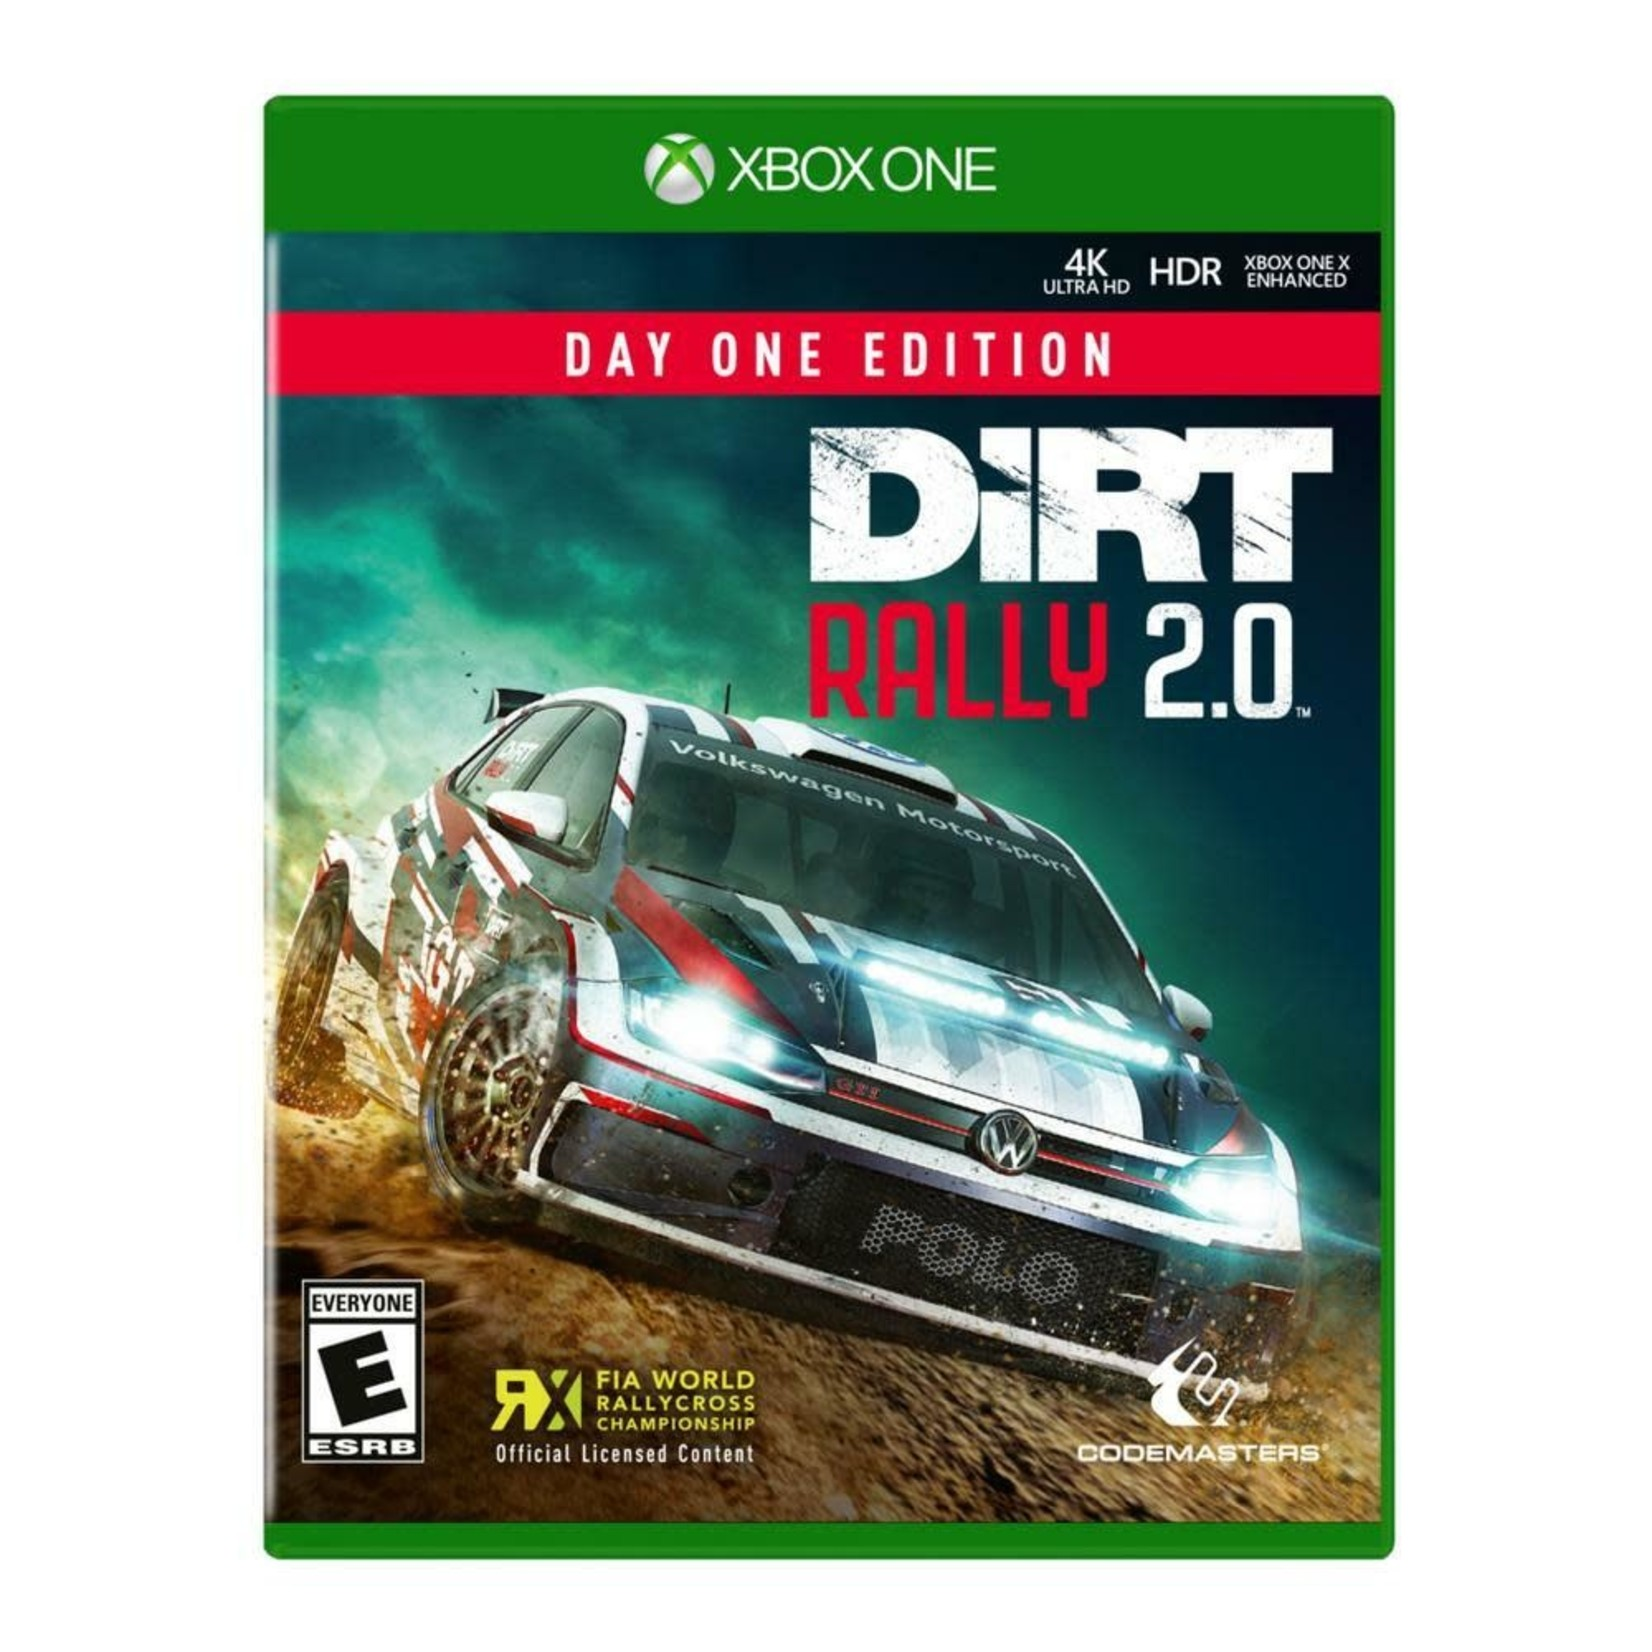 XB1-Dirt Rally 2.0